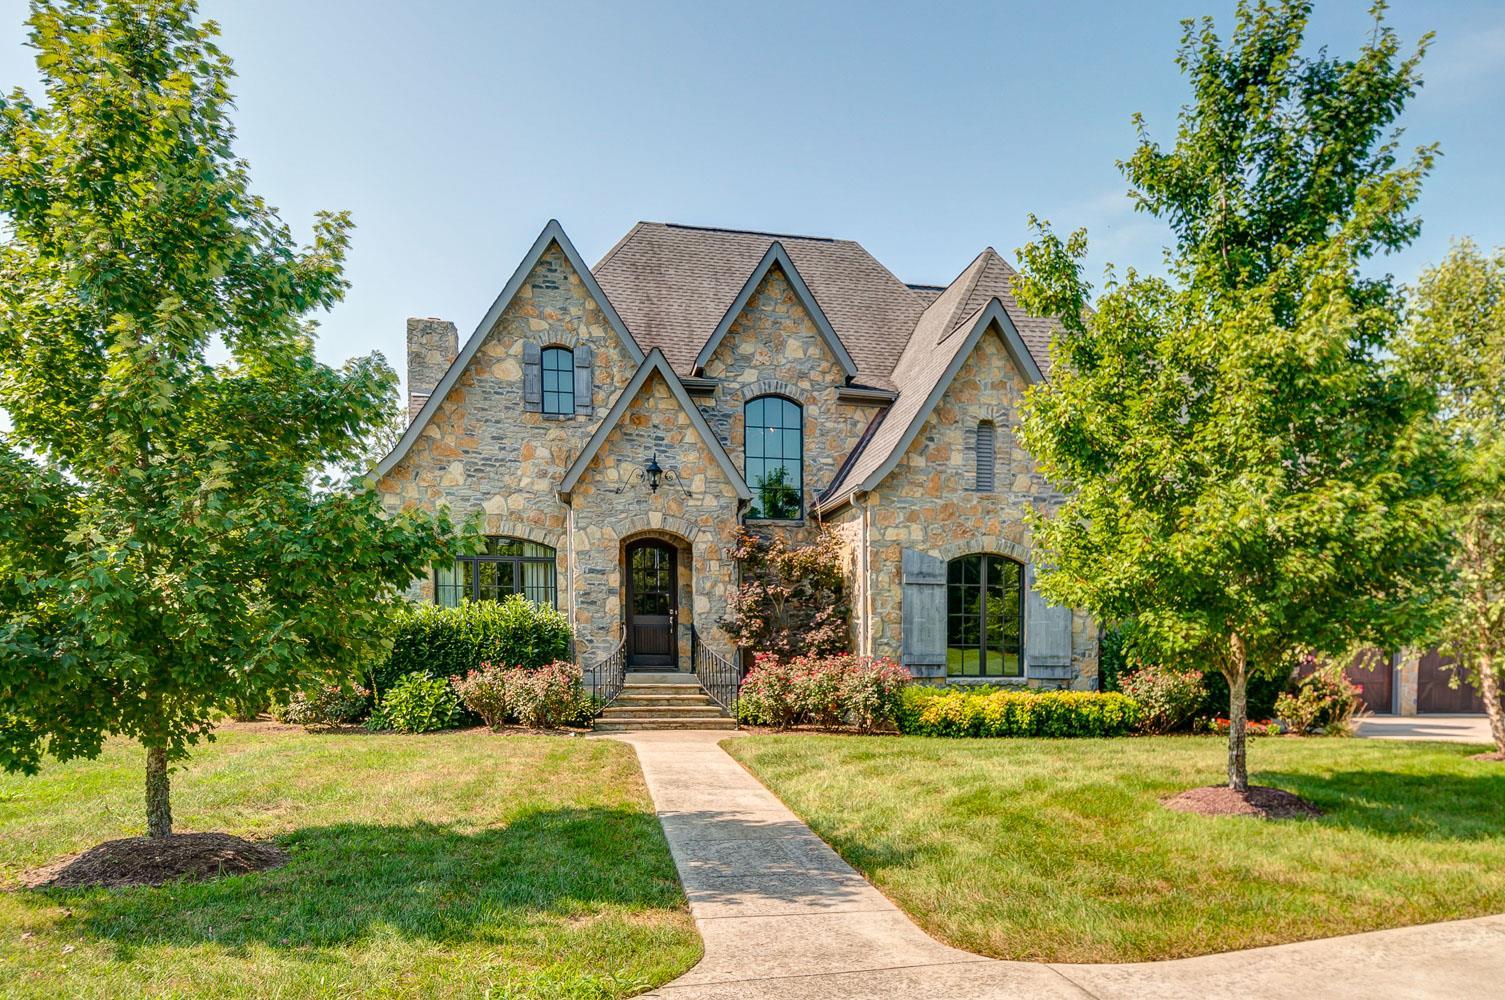 4020 Jessica Lane, Franklin, TN 37064 - Franklin, TN real estate listing